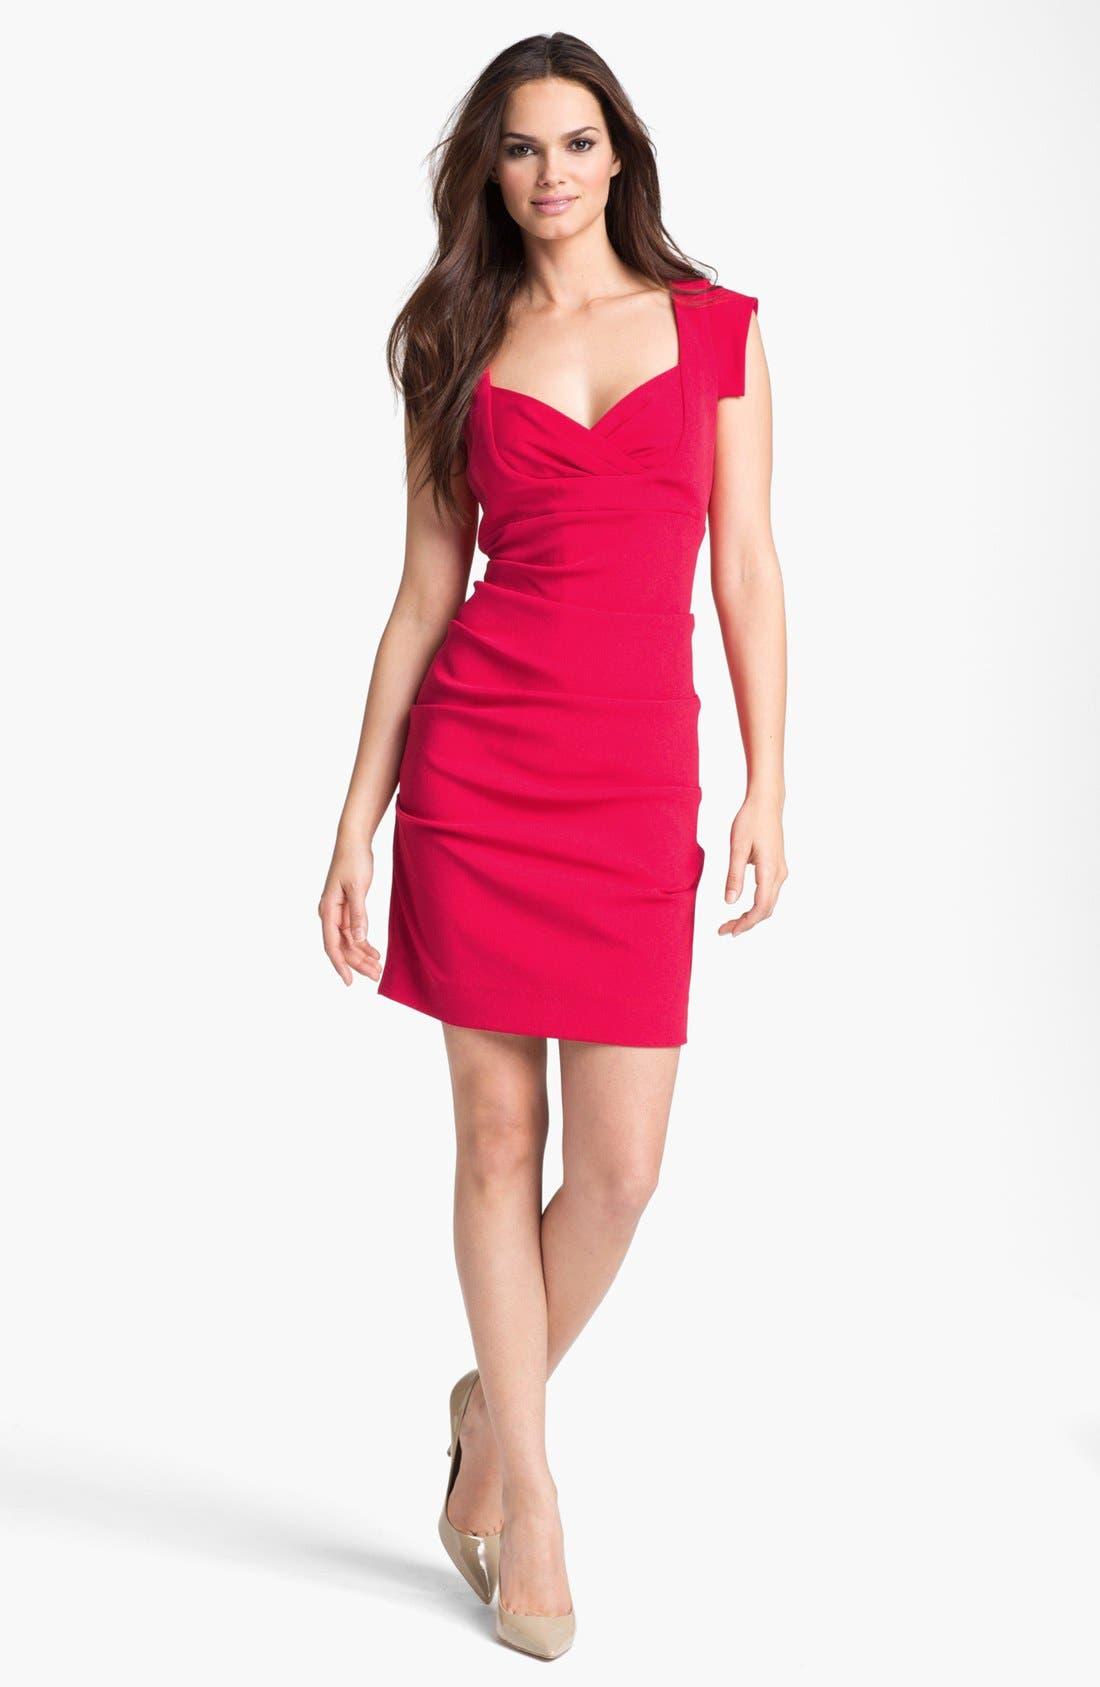 Alternate Image 1 Selected - Nicole Miller Satin Crepe Sheath Dress